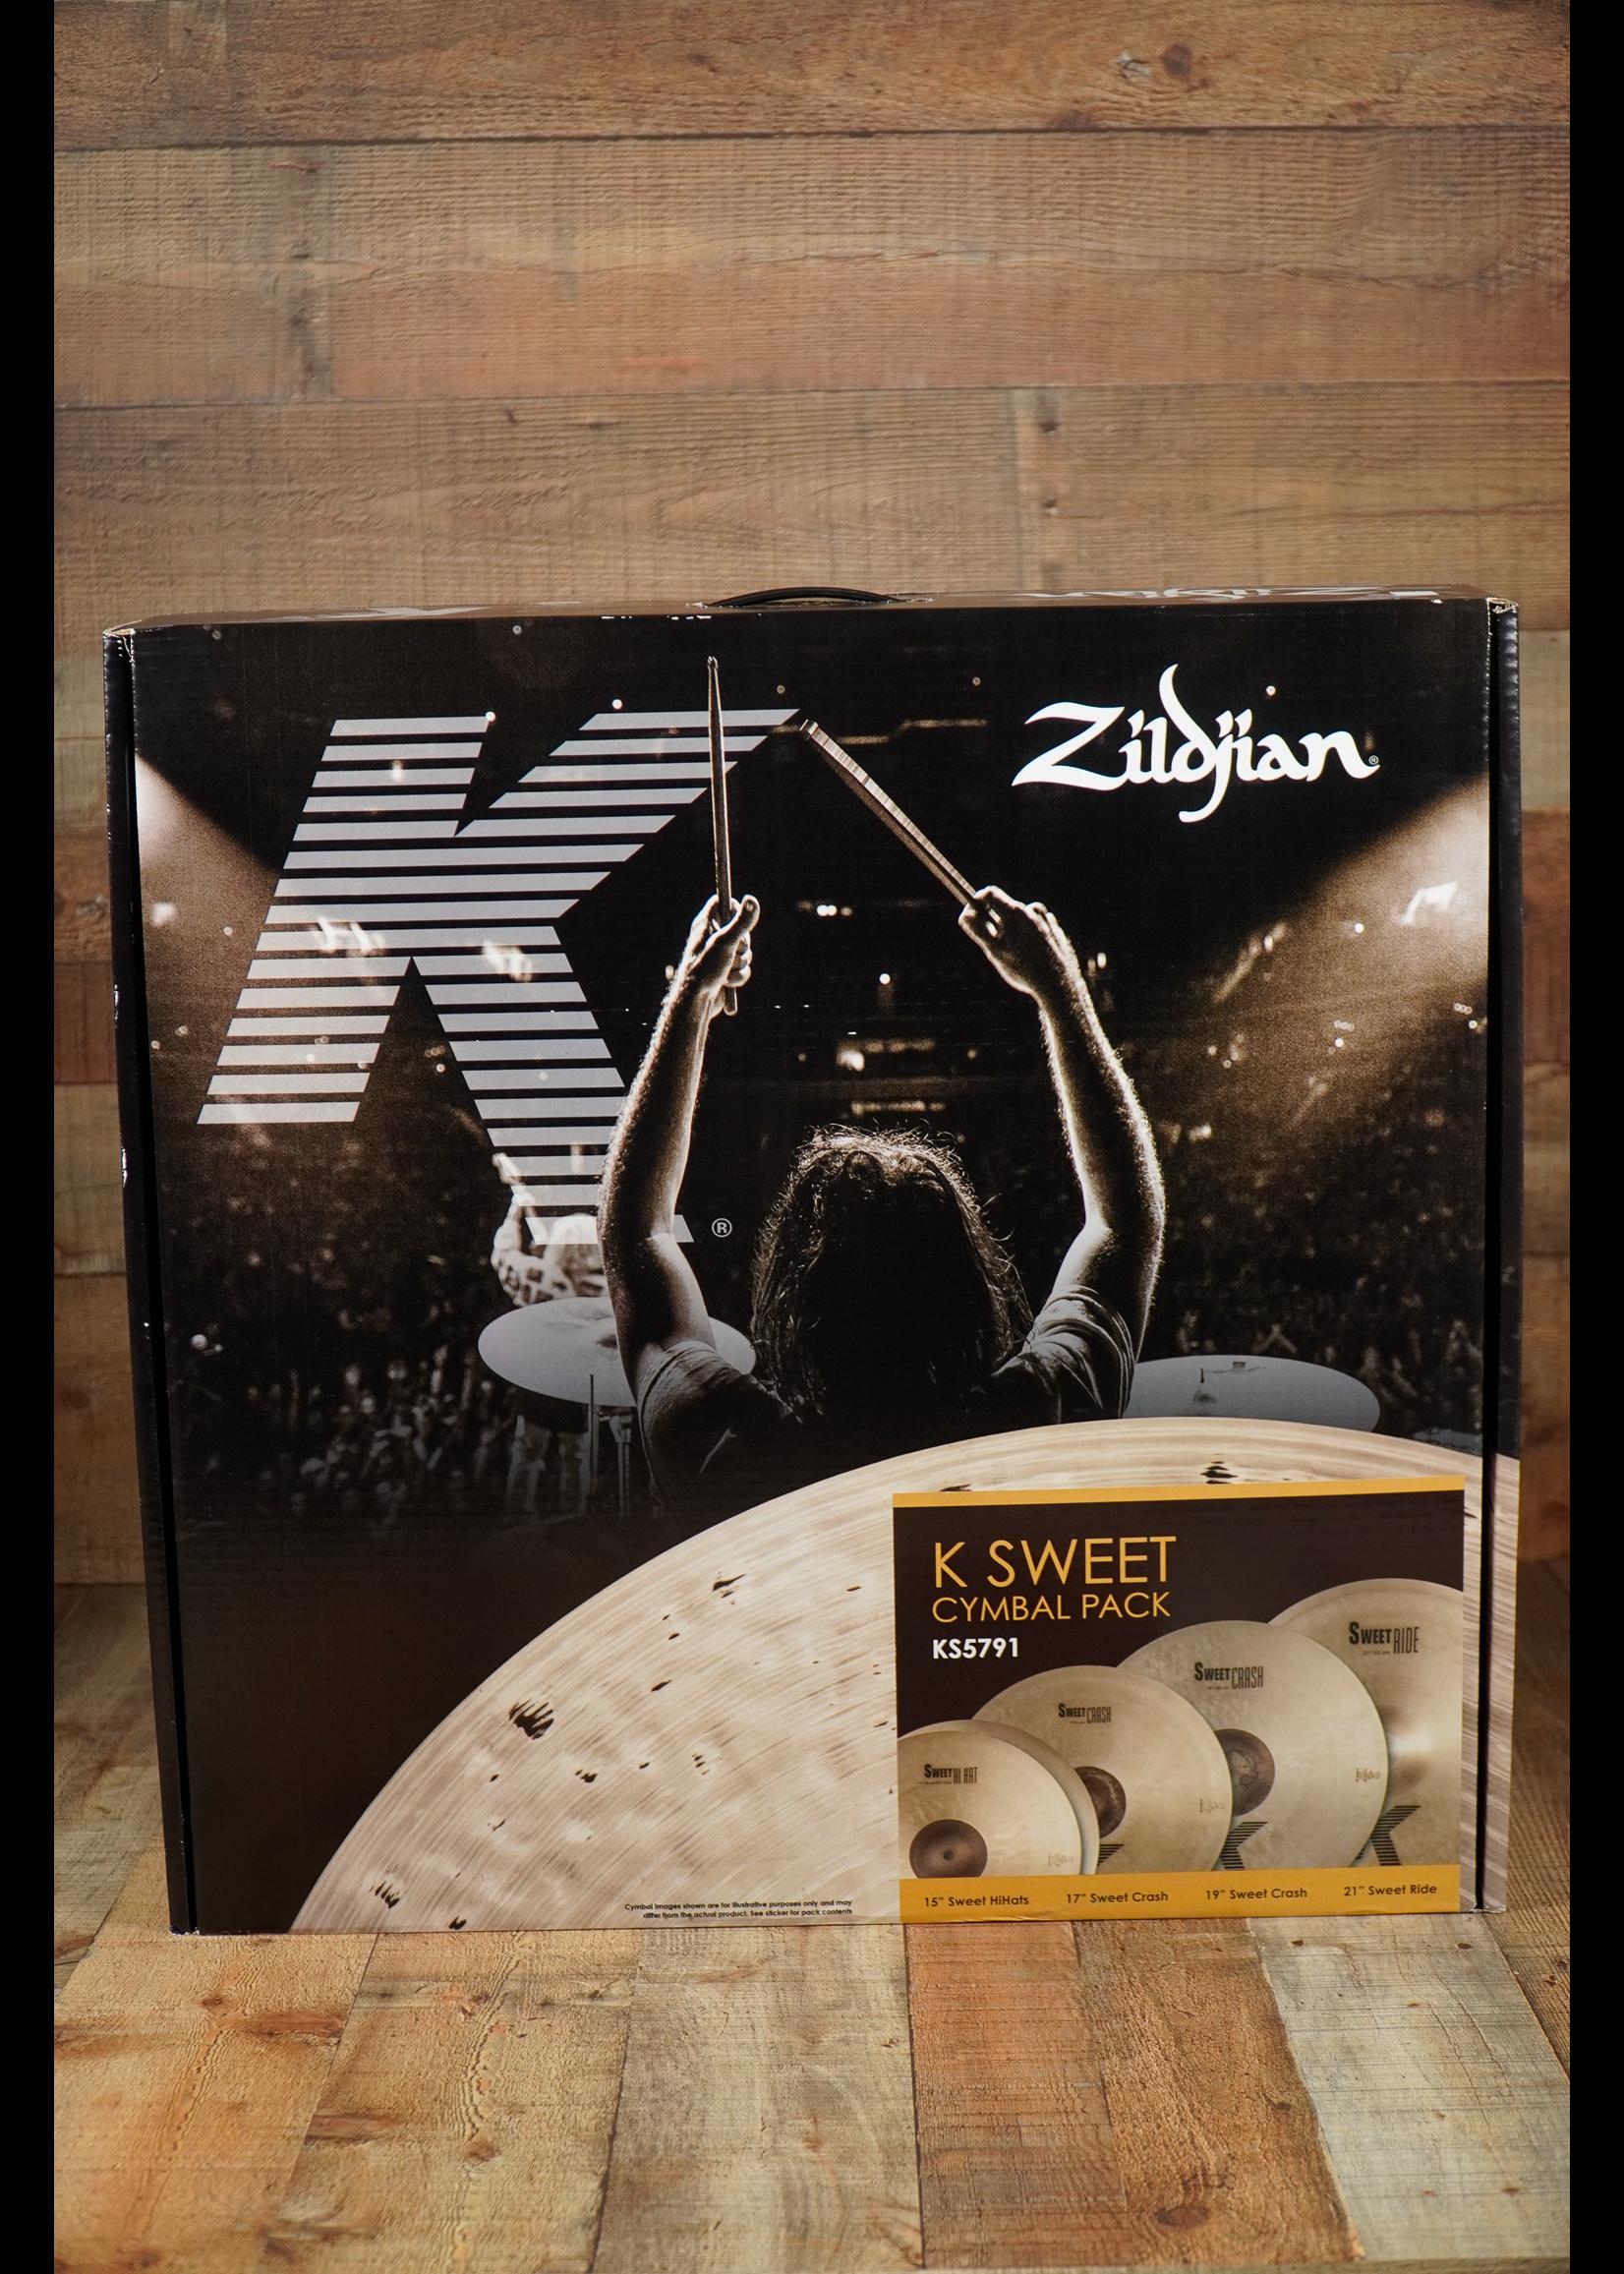 Zildjian K Zildjian Sweet Cymbal Pack